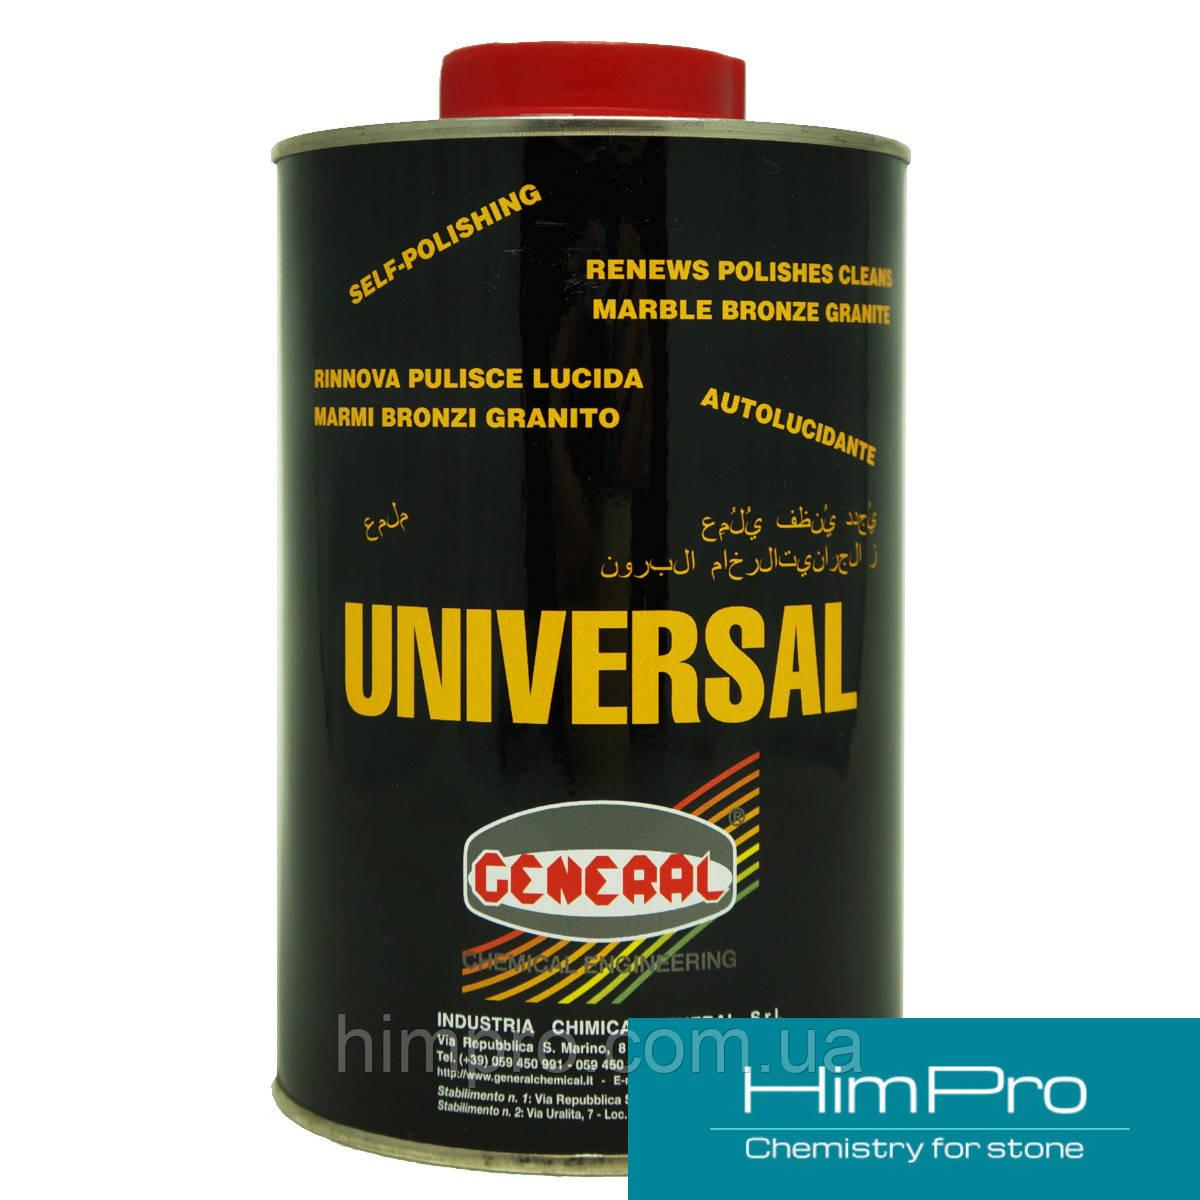 UNIVERSAL LIQUIDO 1L General Само-полирующее средство (лак)